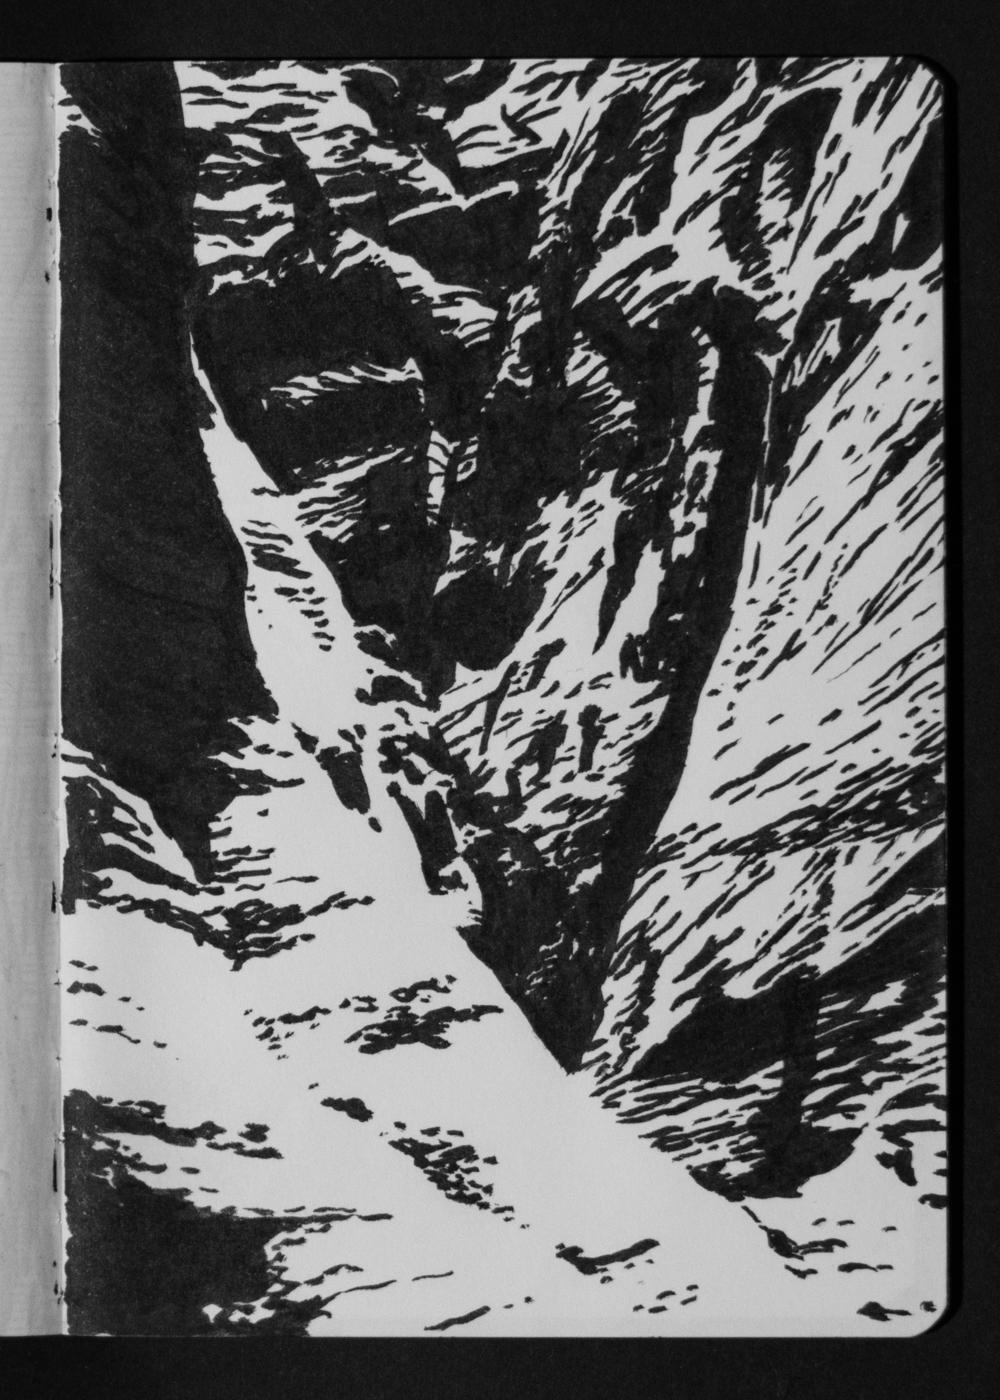 04-07 Baptist Draw Snowy.jpg